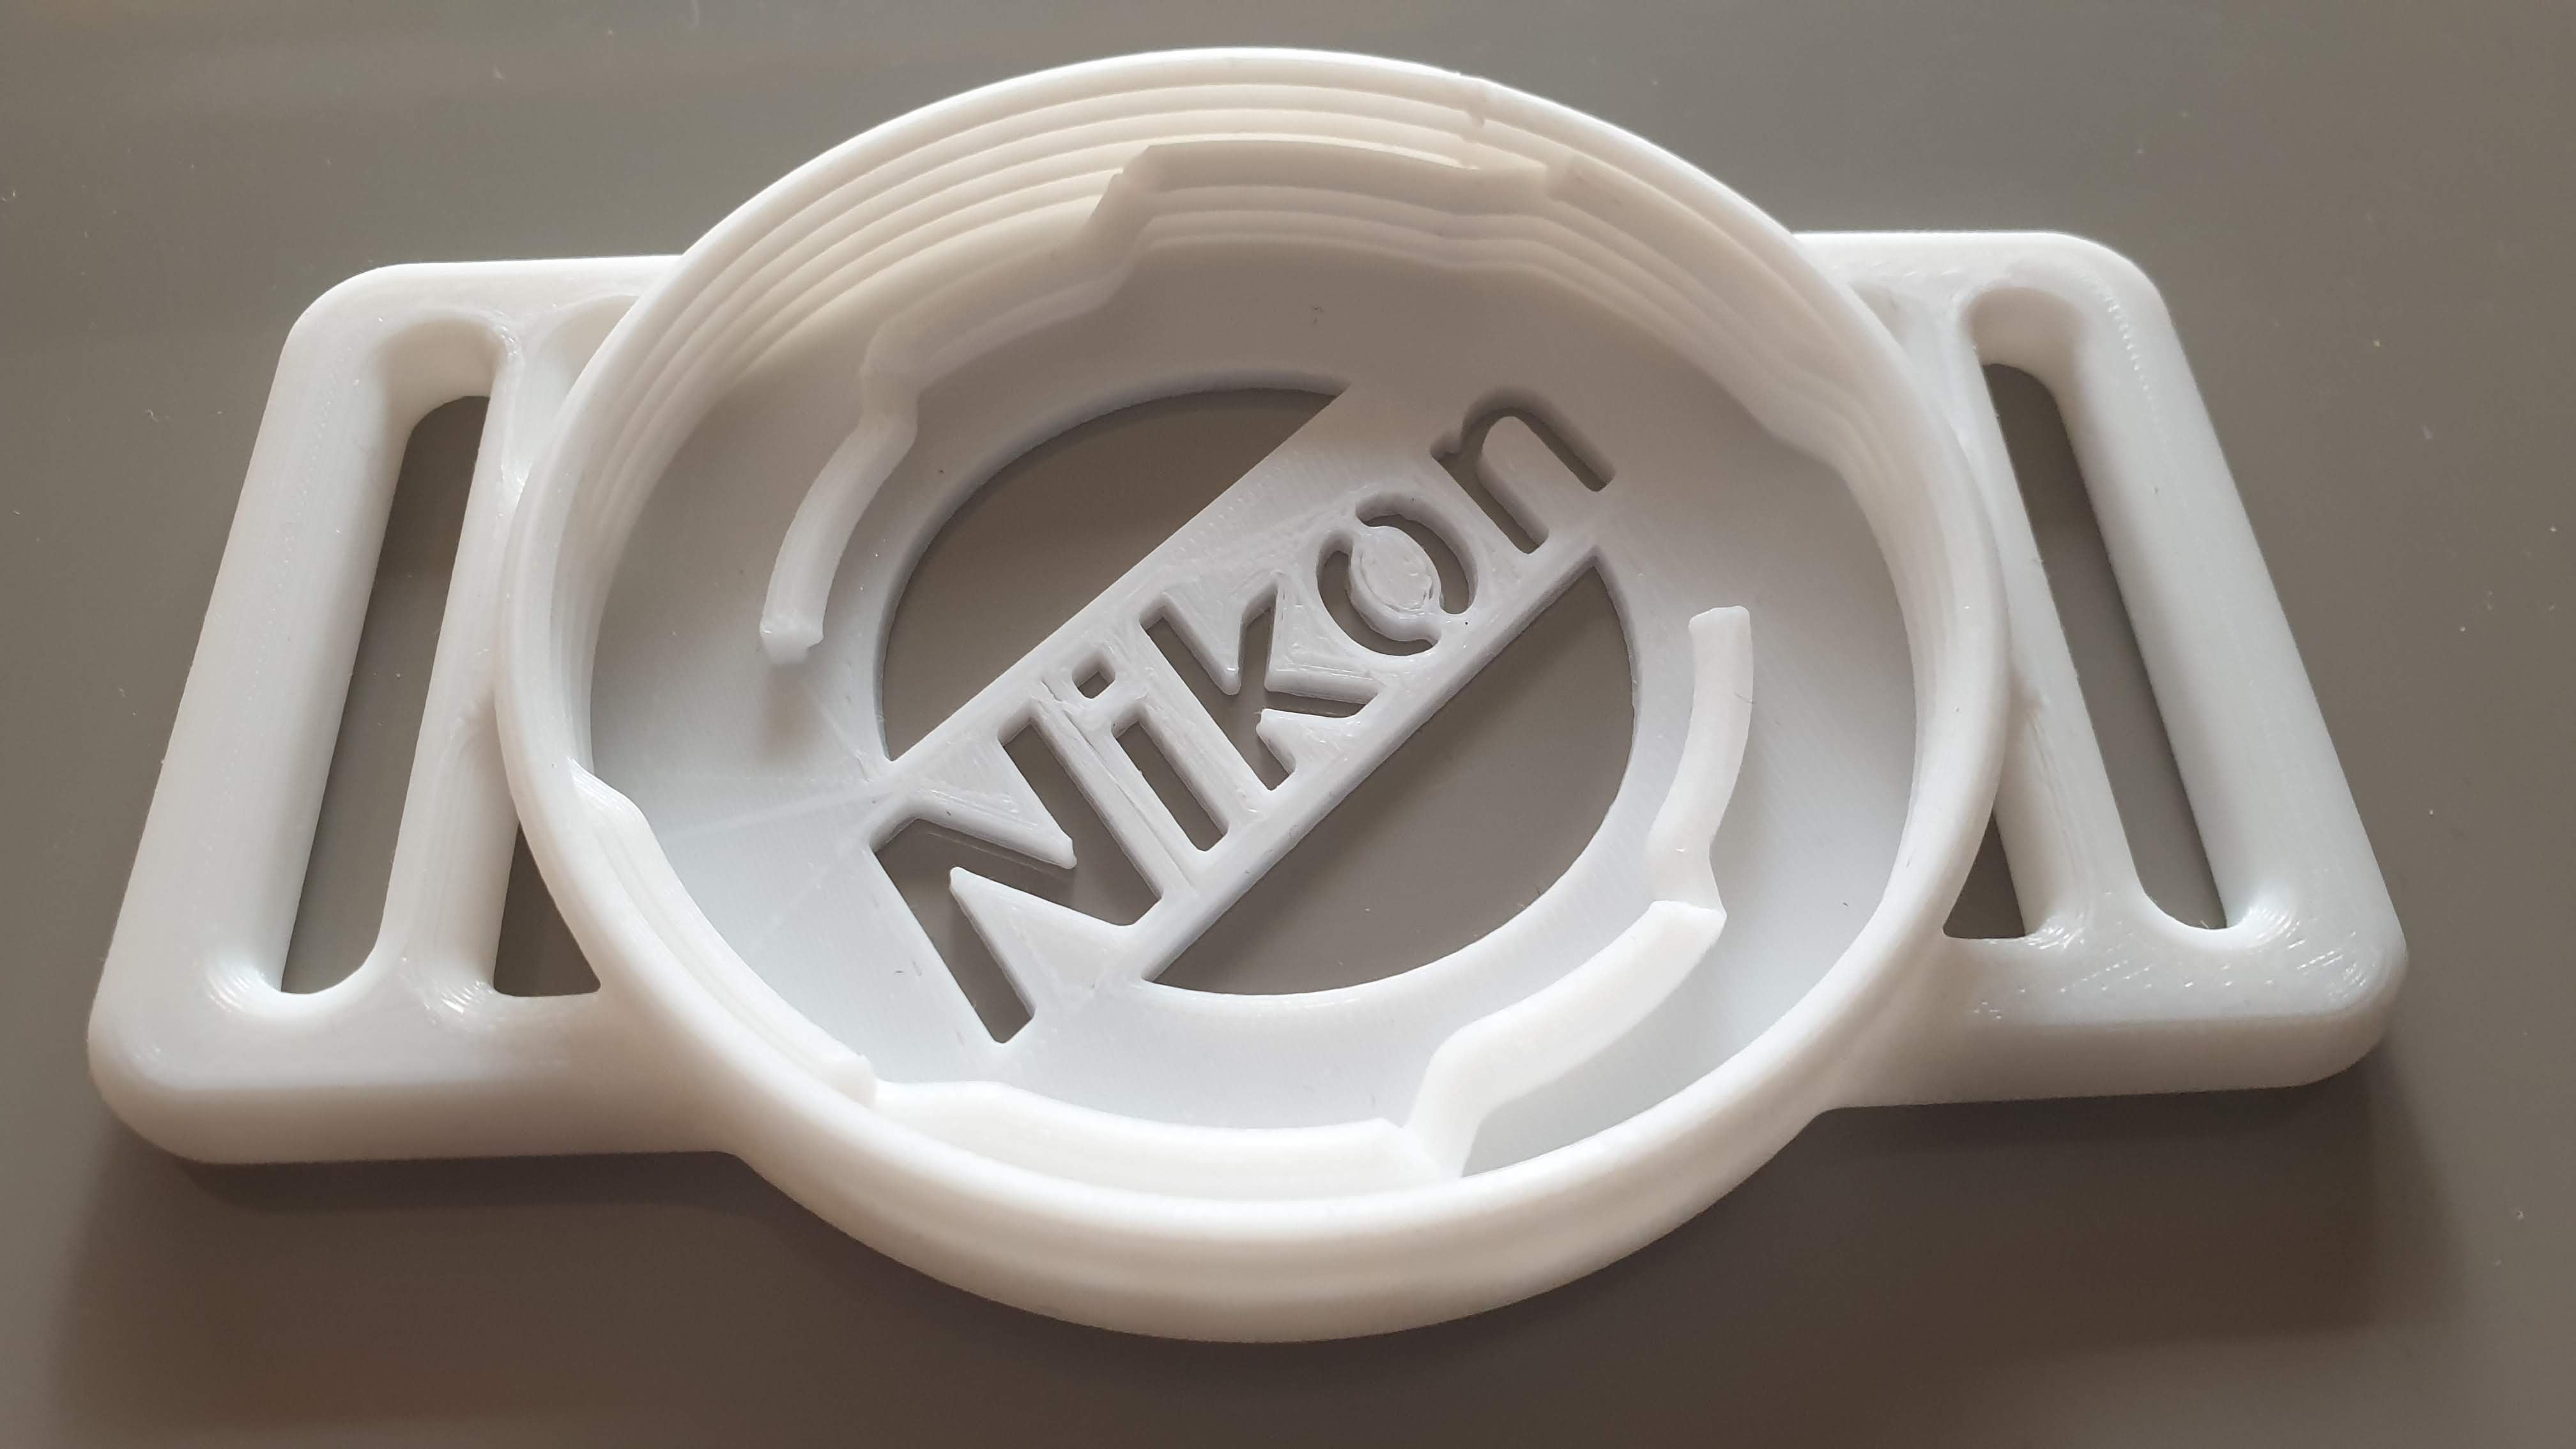 Nikon Lens cap Koroyucu Kapak Tutucu  52 58 67 72 77